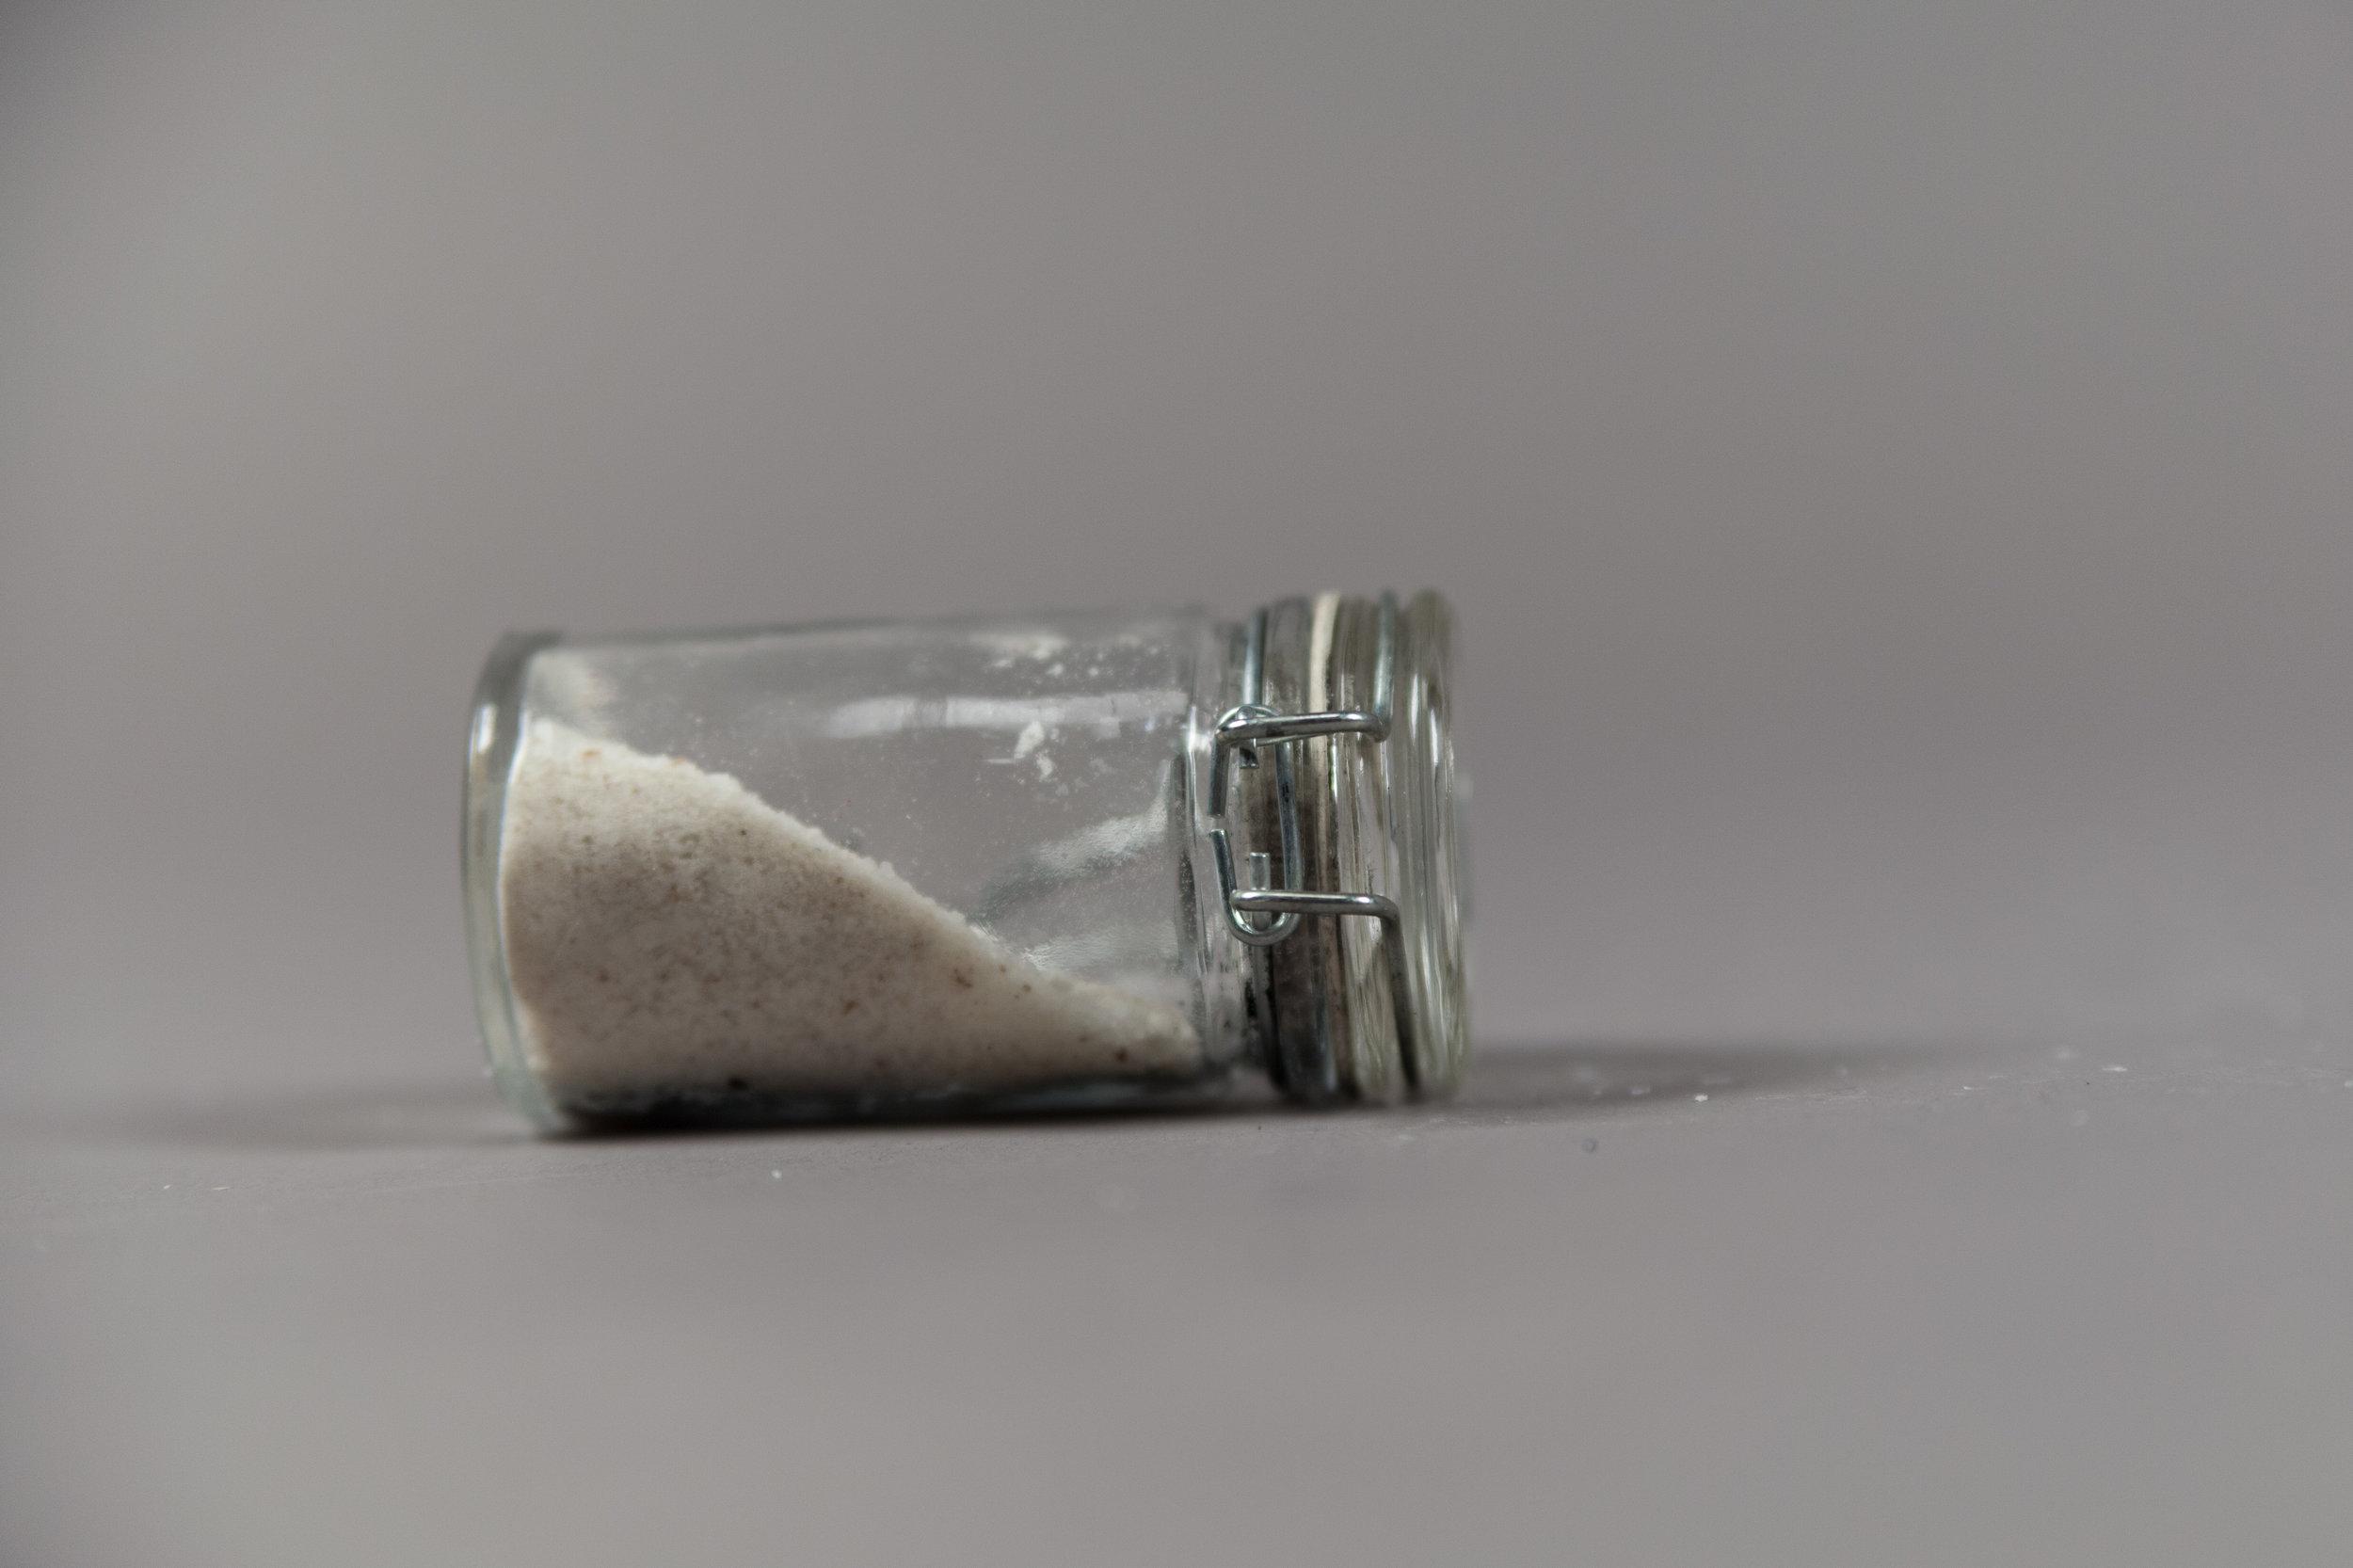 Jar of Salt for Cleaning Holy Utensils